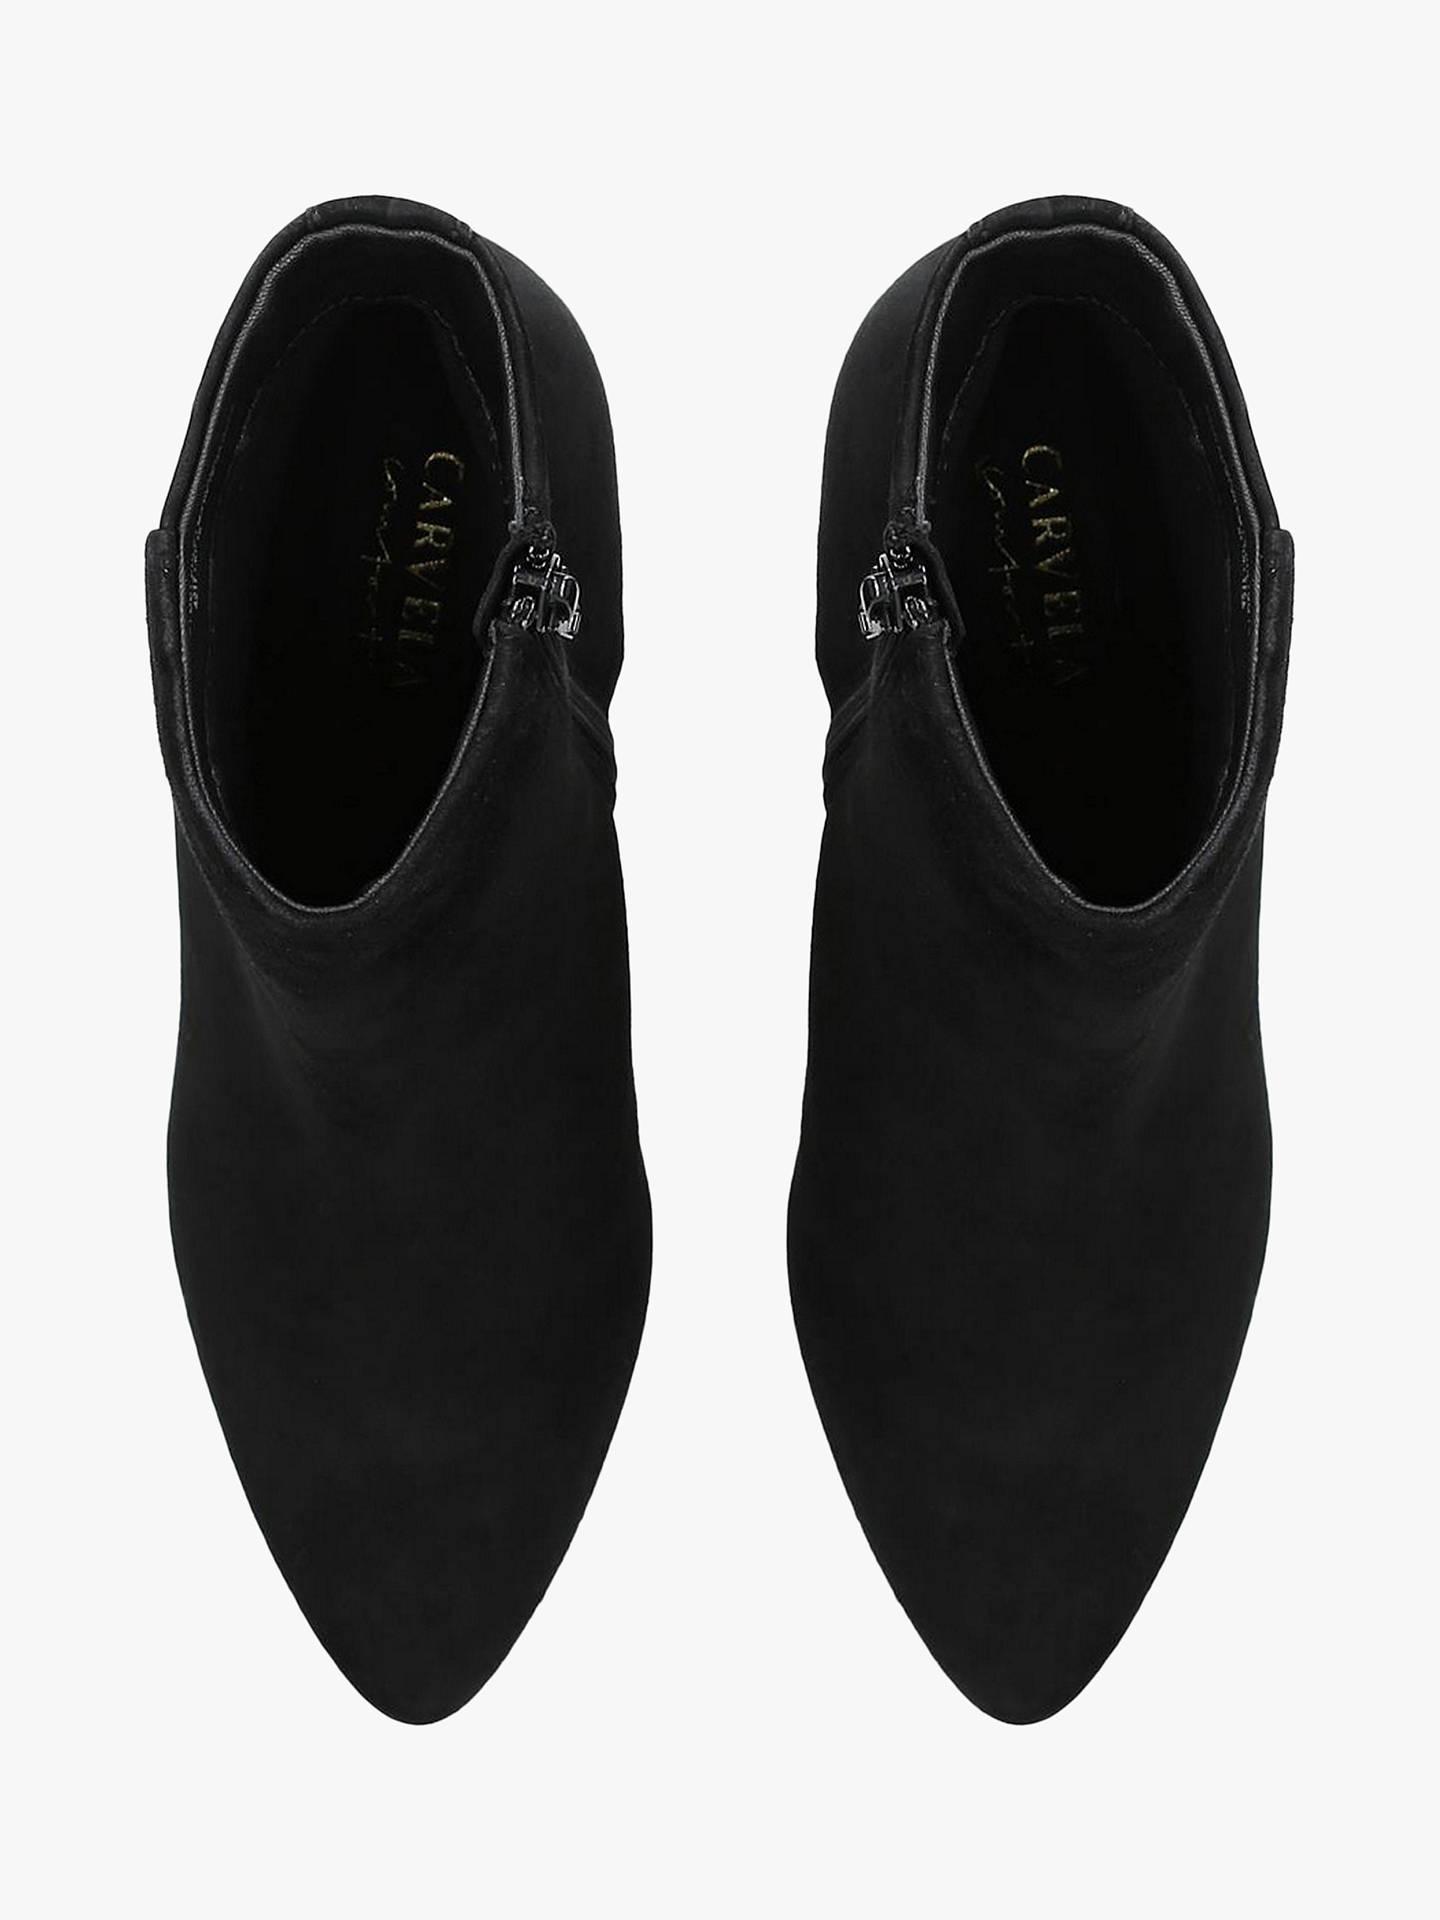 fa81504c56f Carvela Comfort Romy Stiletto Pointed Toe Ankle Boots, Black